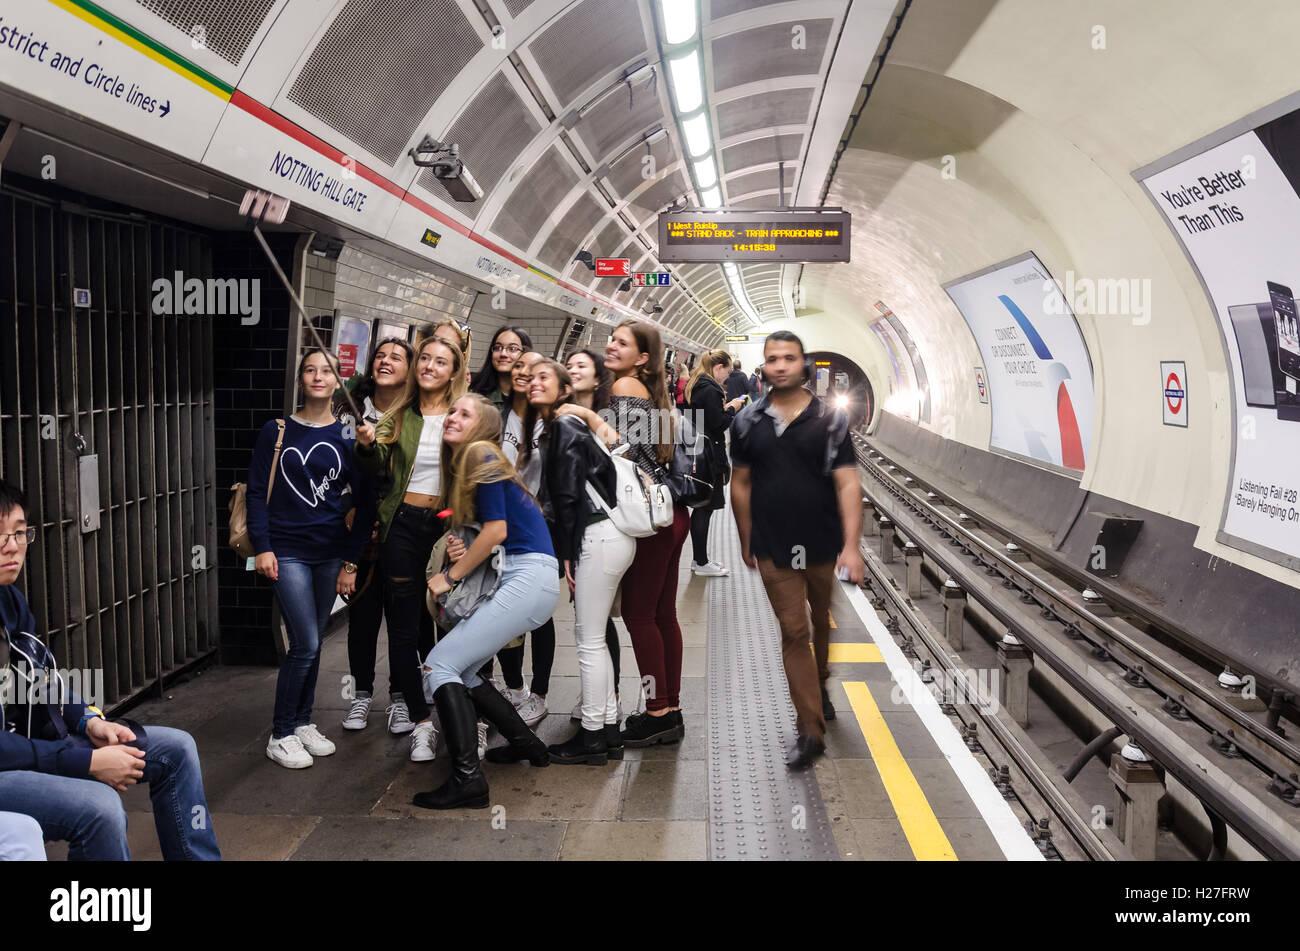 a-group-of-teenage-girls-take-a-selfie-w